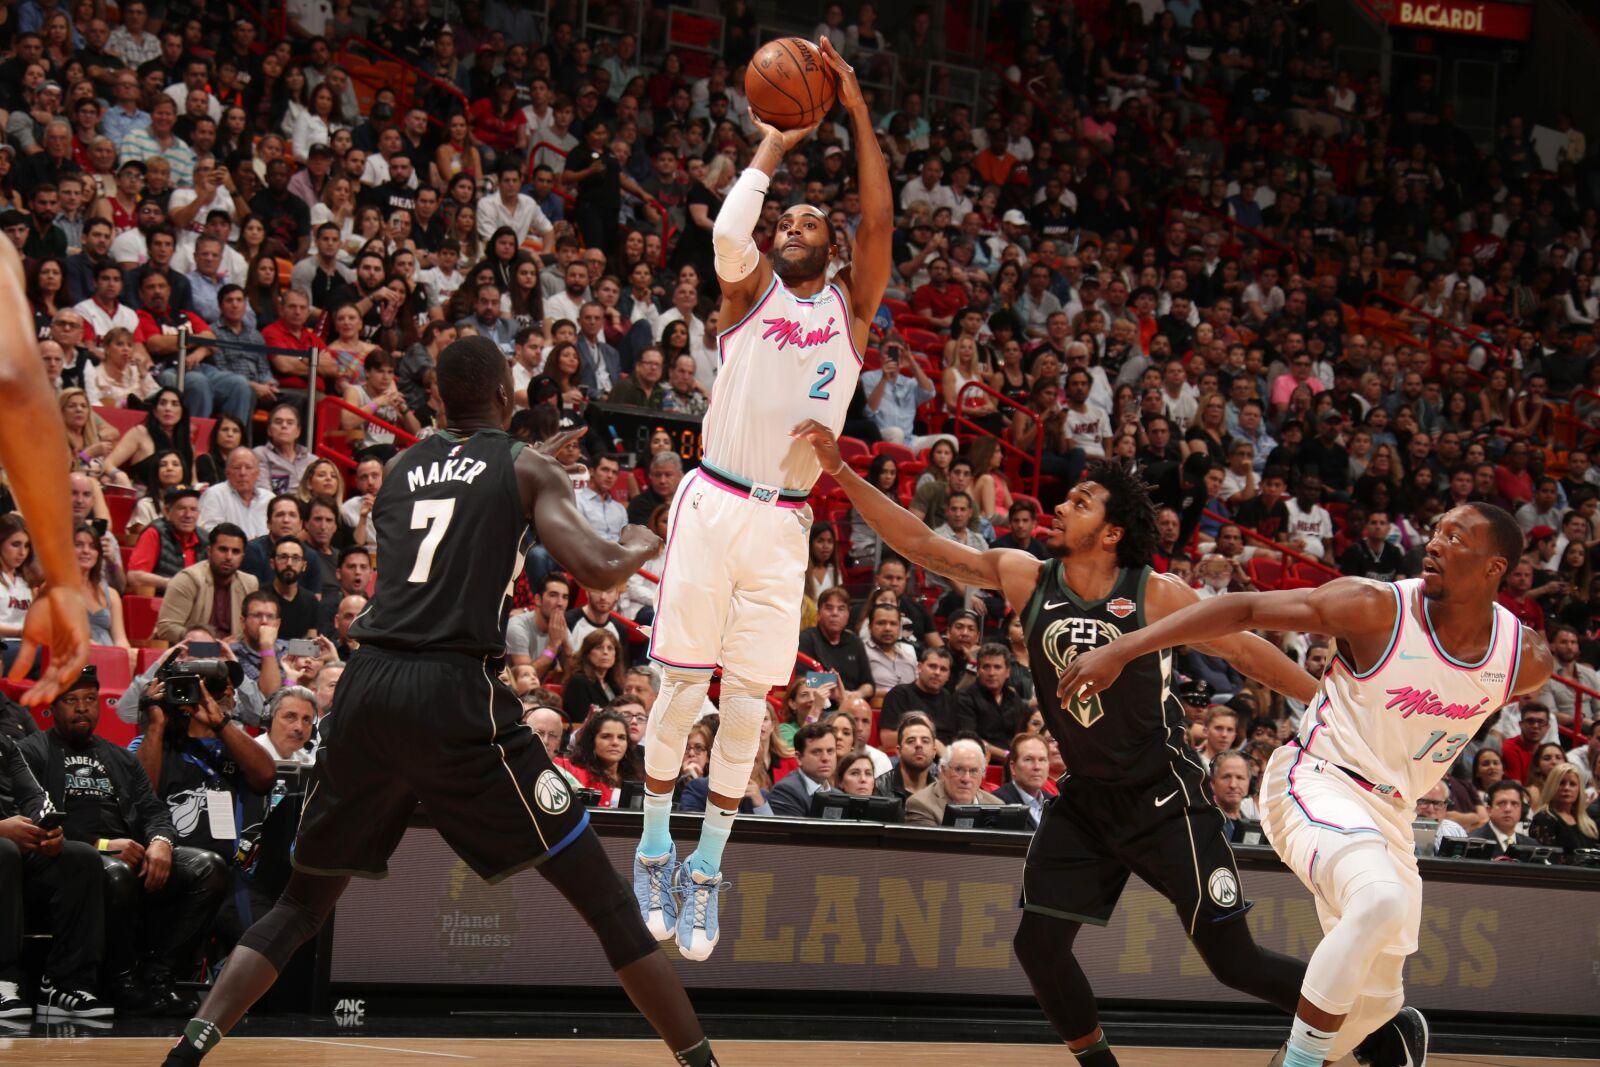 d60c00b9d Can the Miami Heat survive losing Wayne Ellington